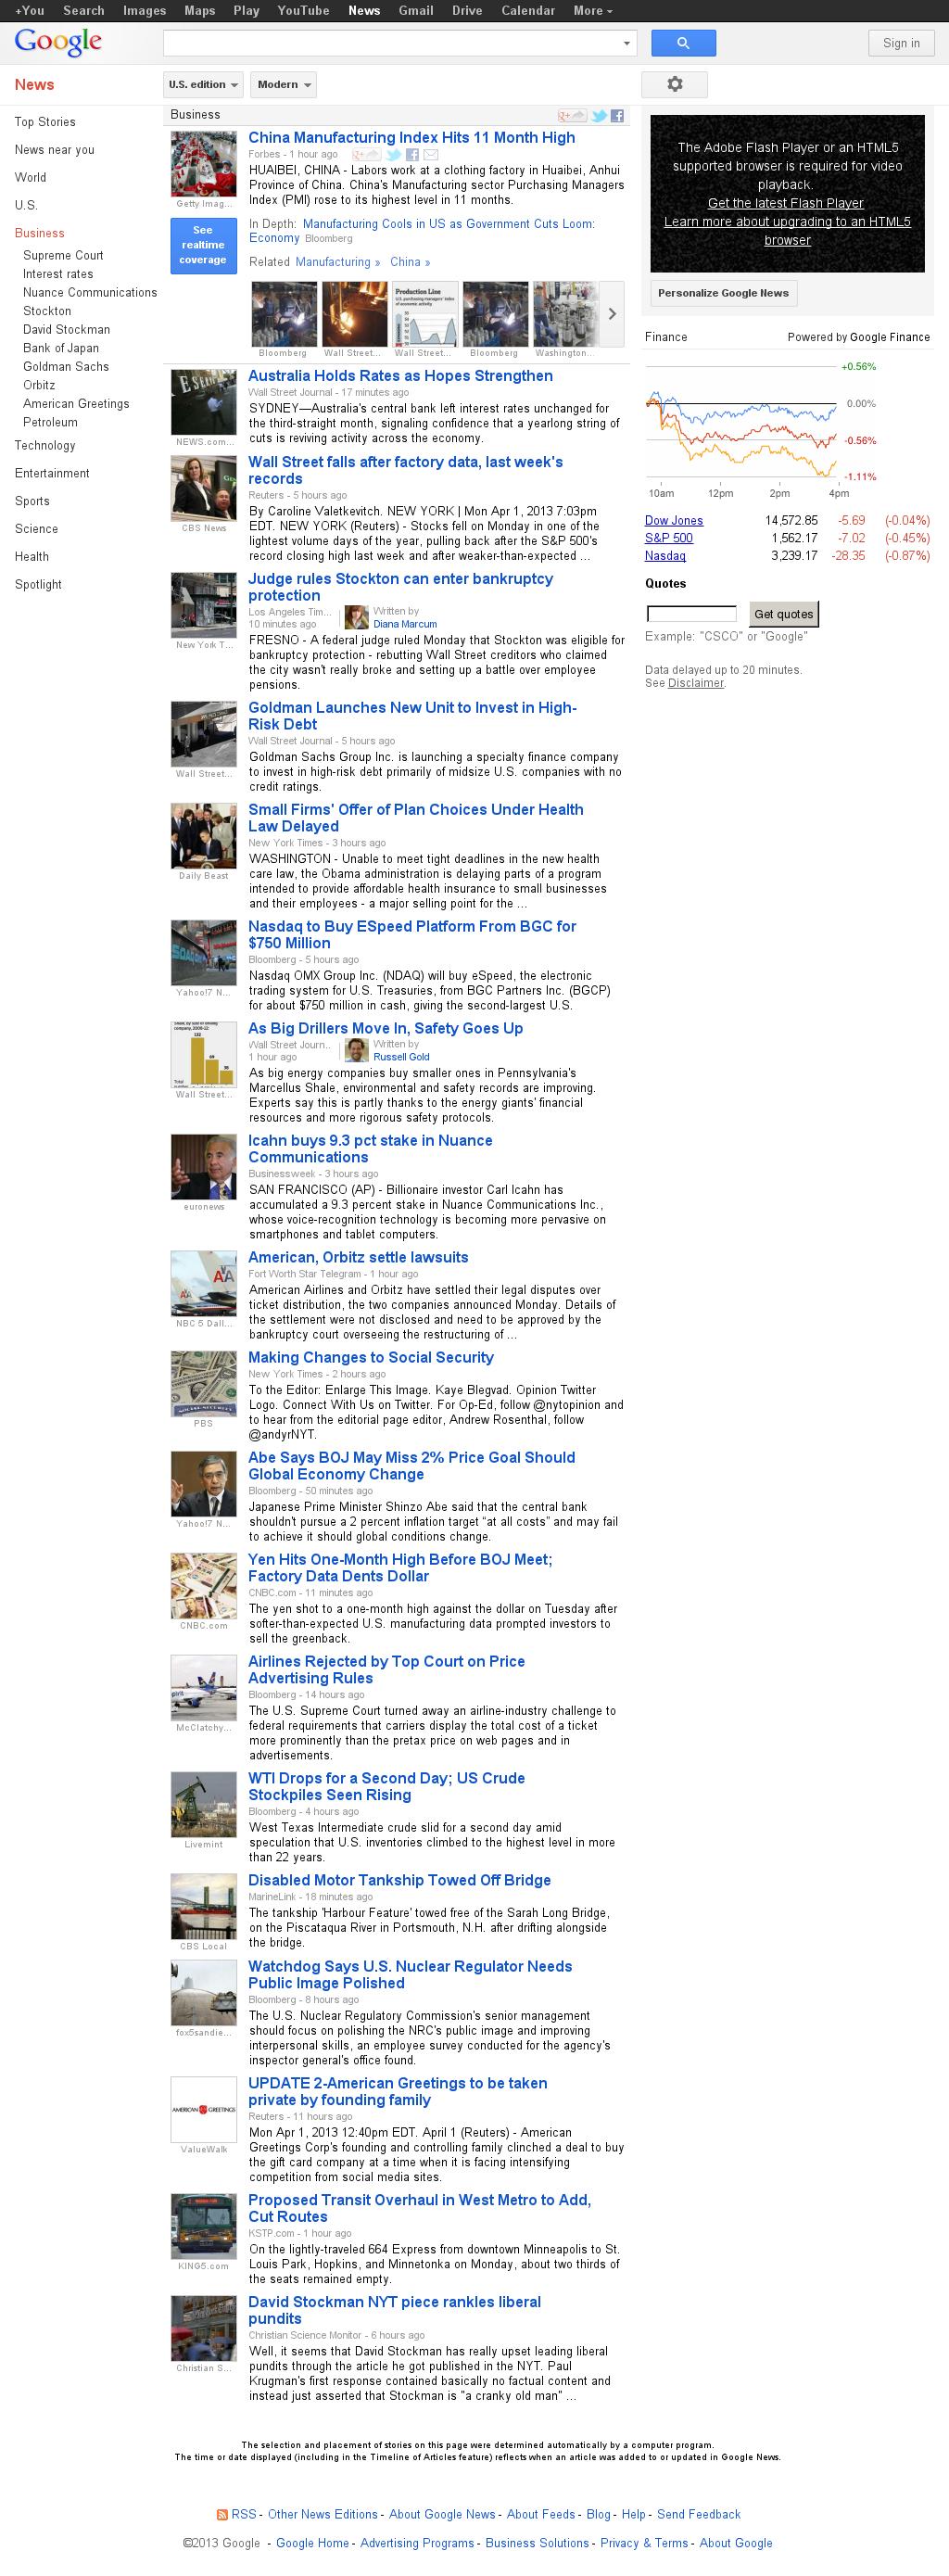 Google News: Business at Tuesday April 2, 2013, 4:07 a.m. UTC